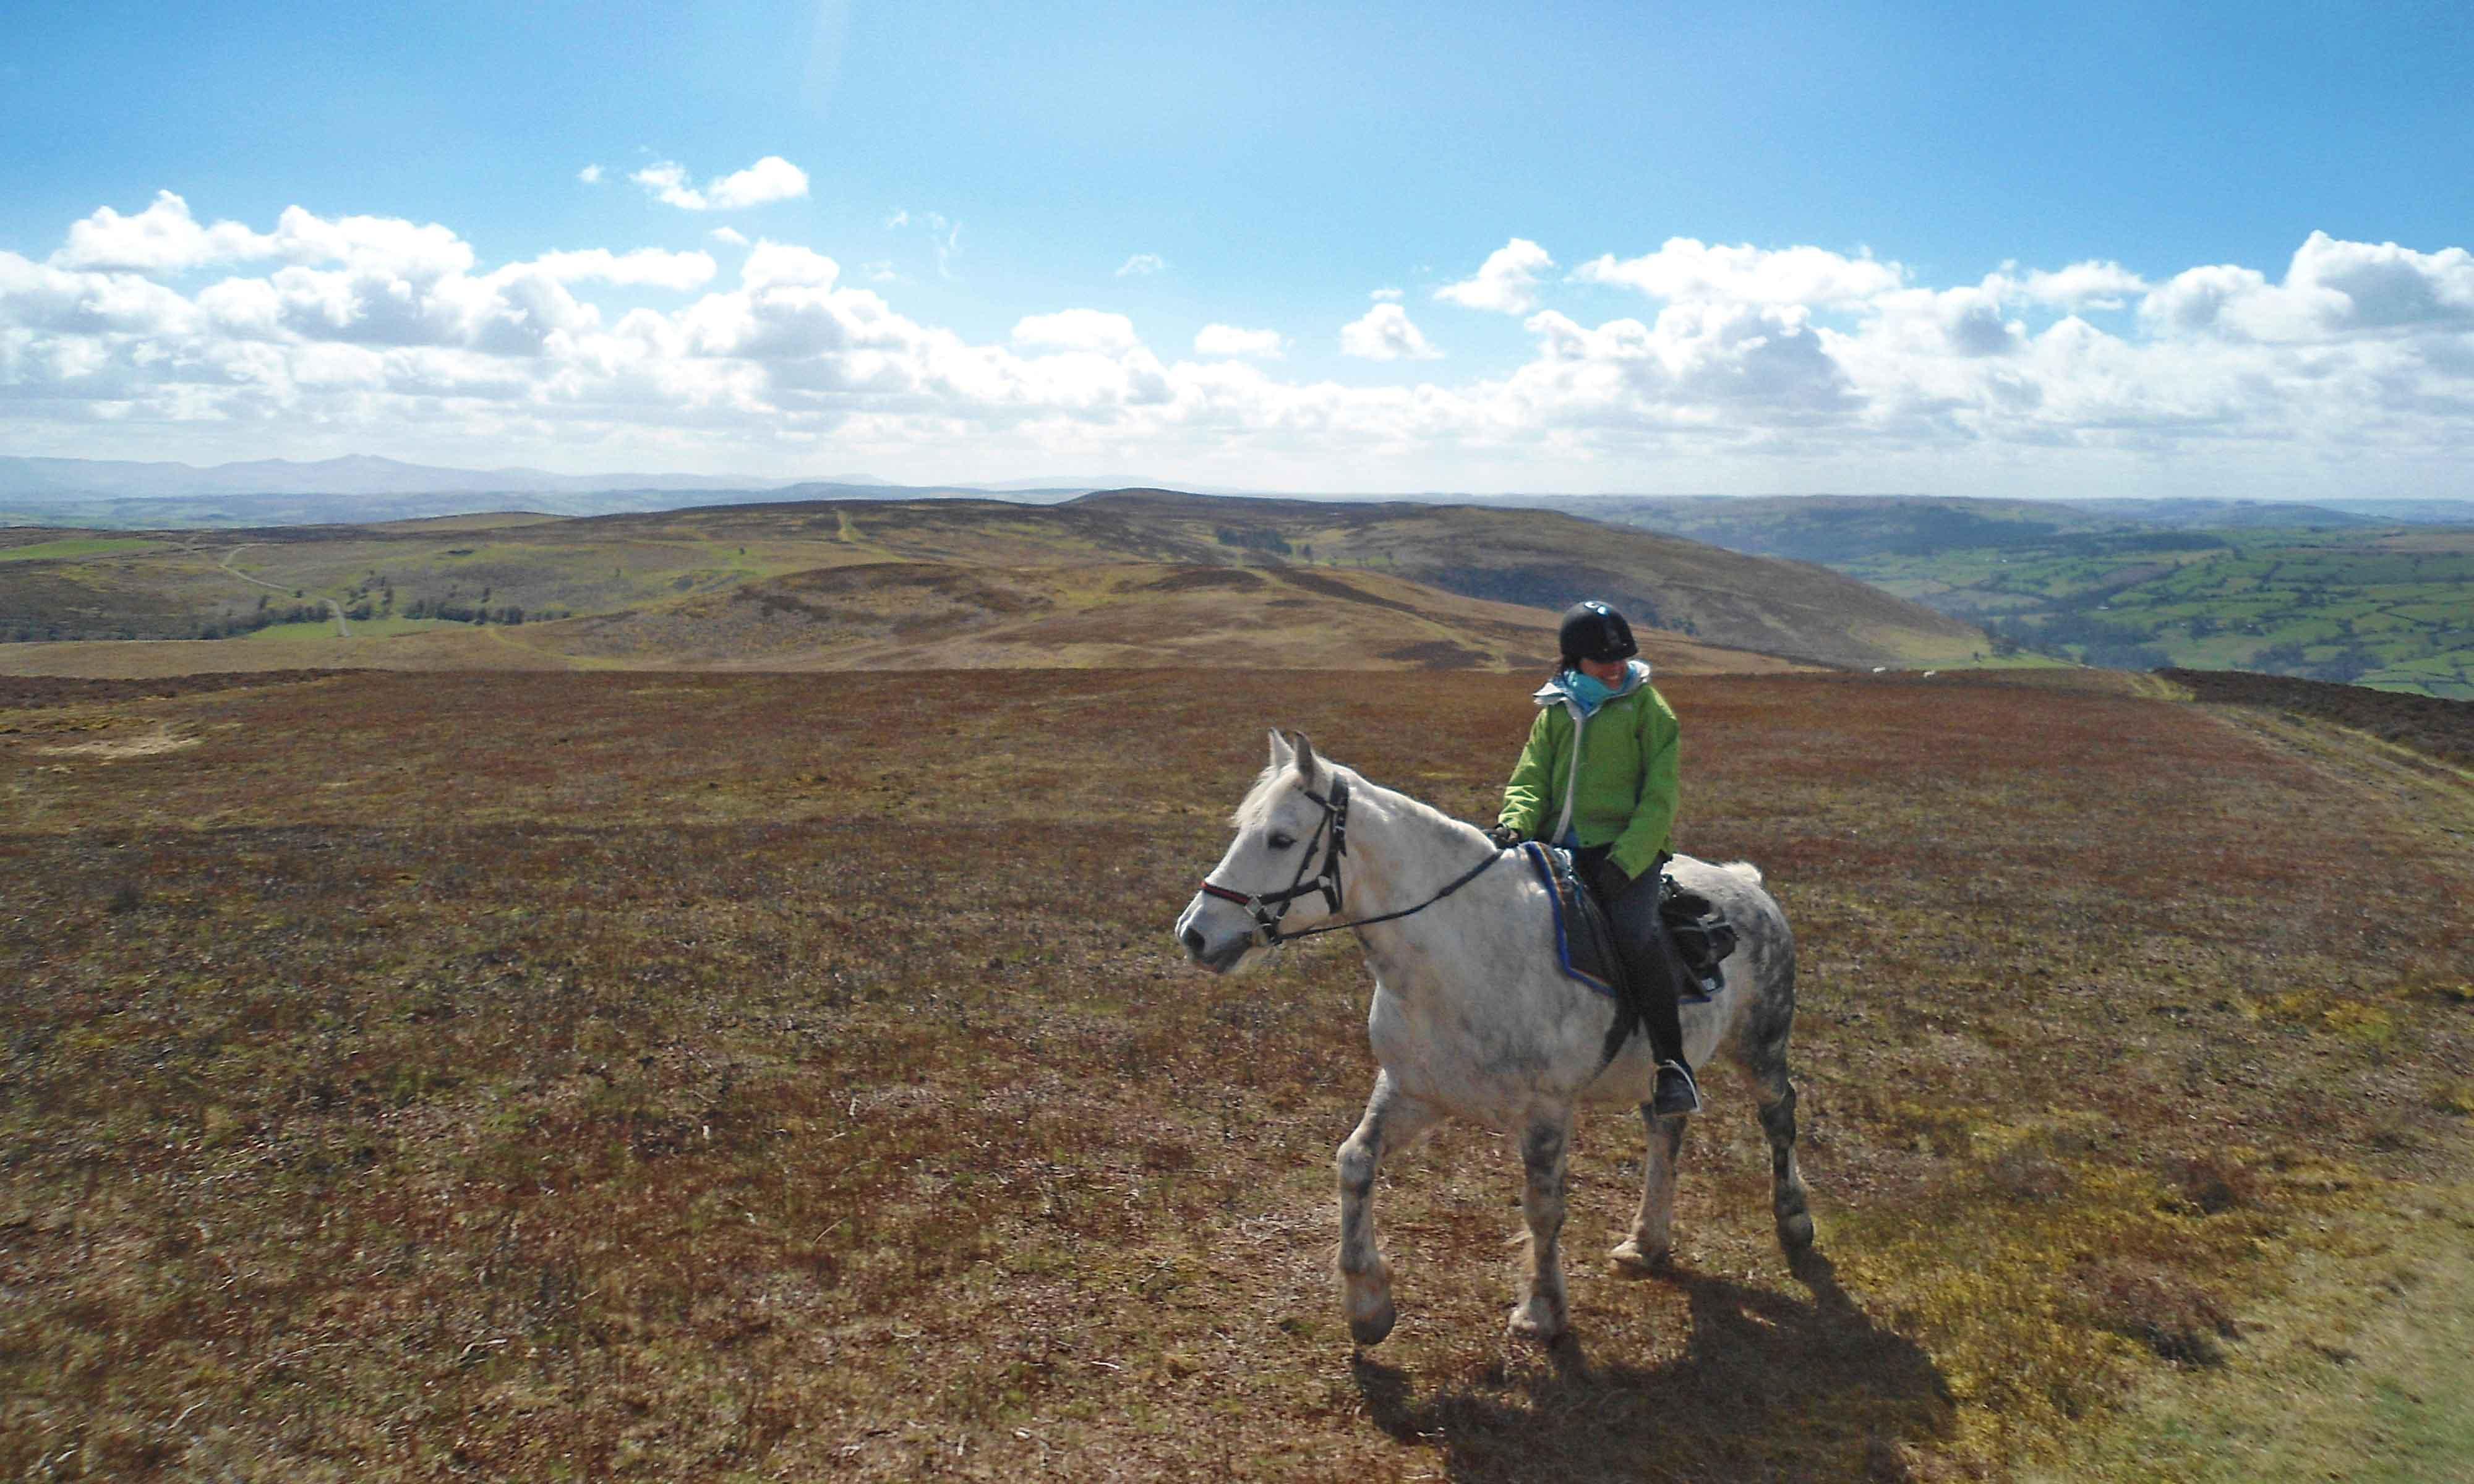 Radnor Fforest horse riding holiday